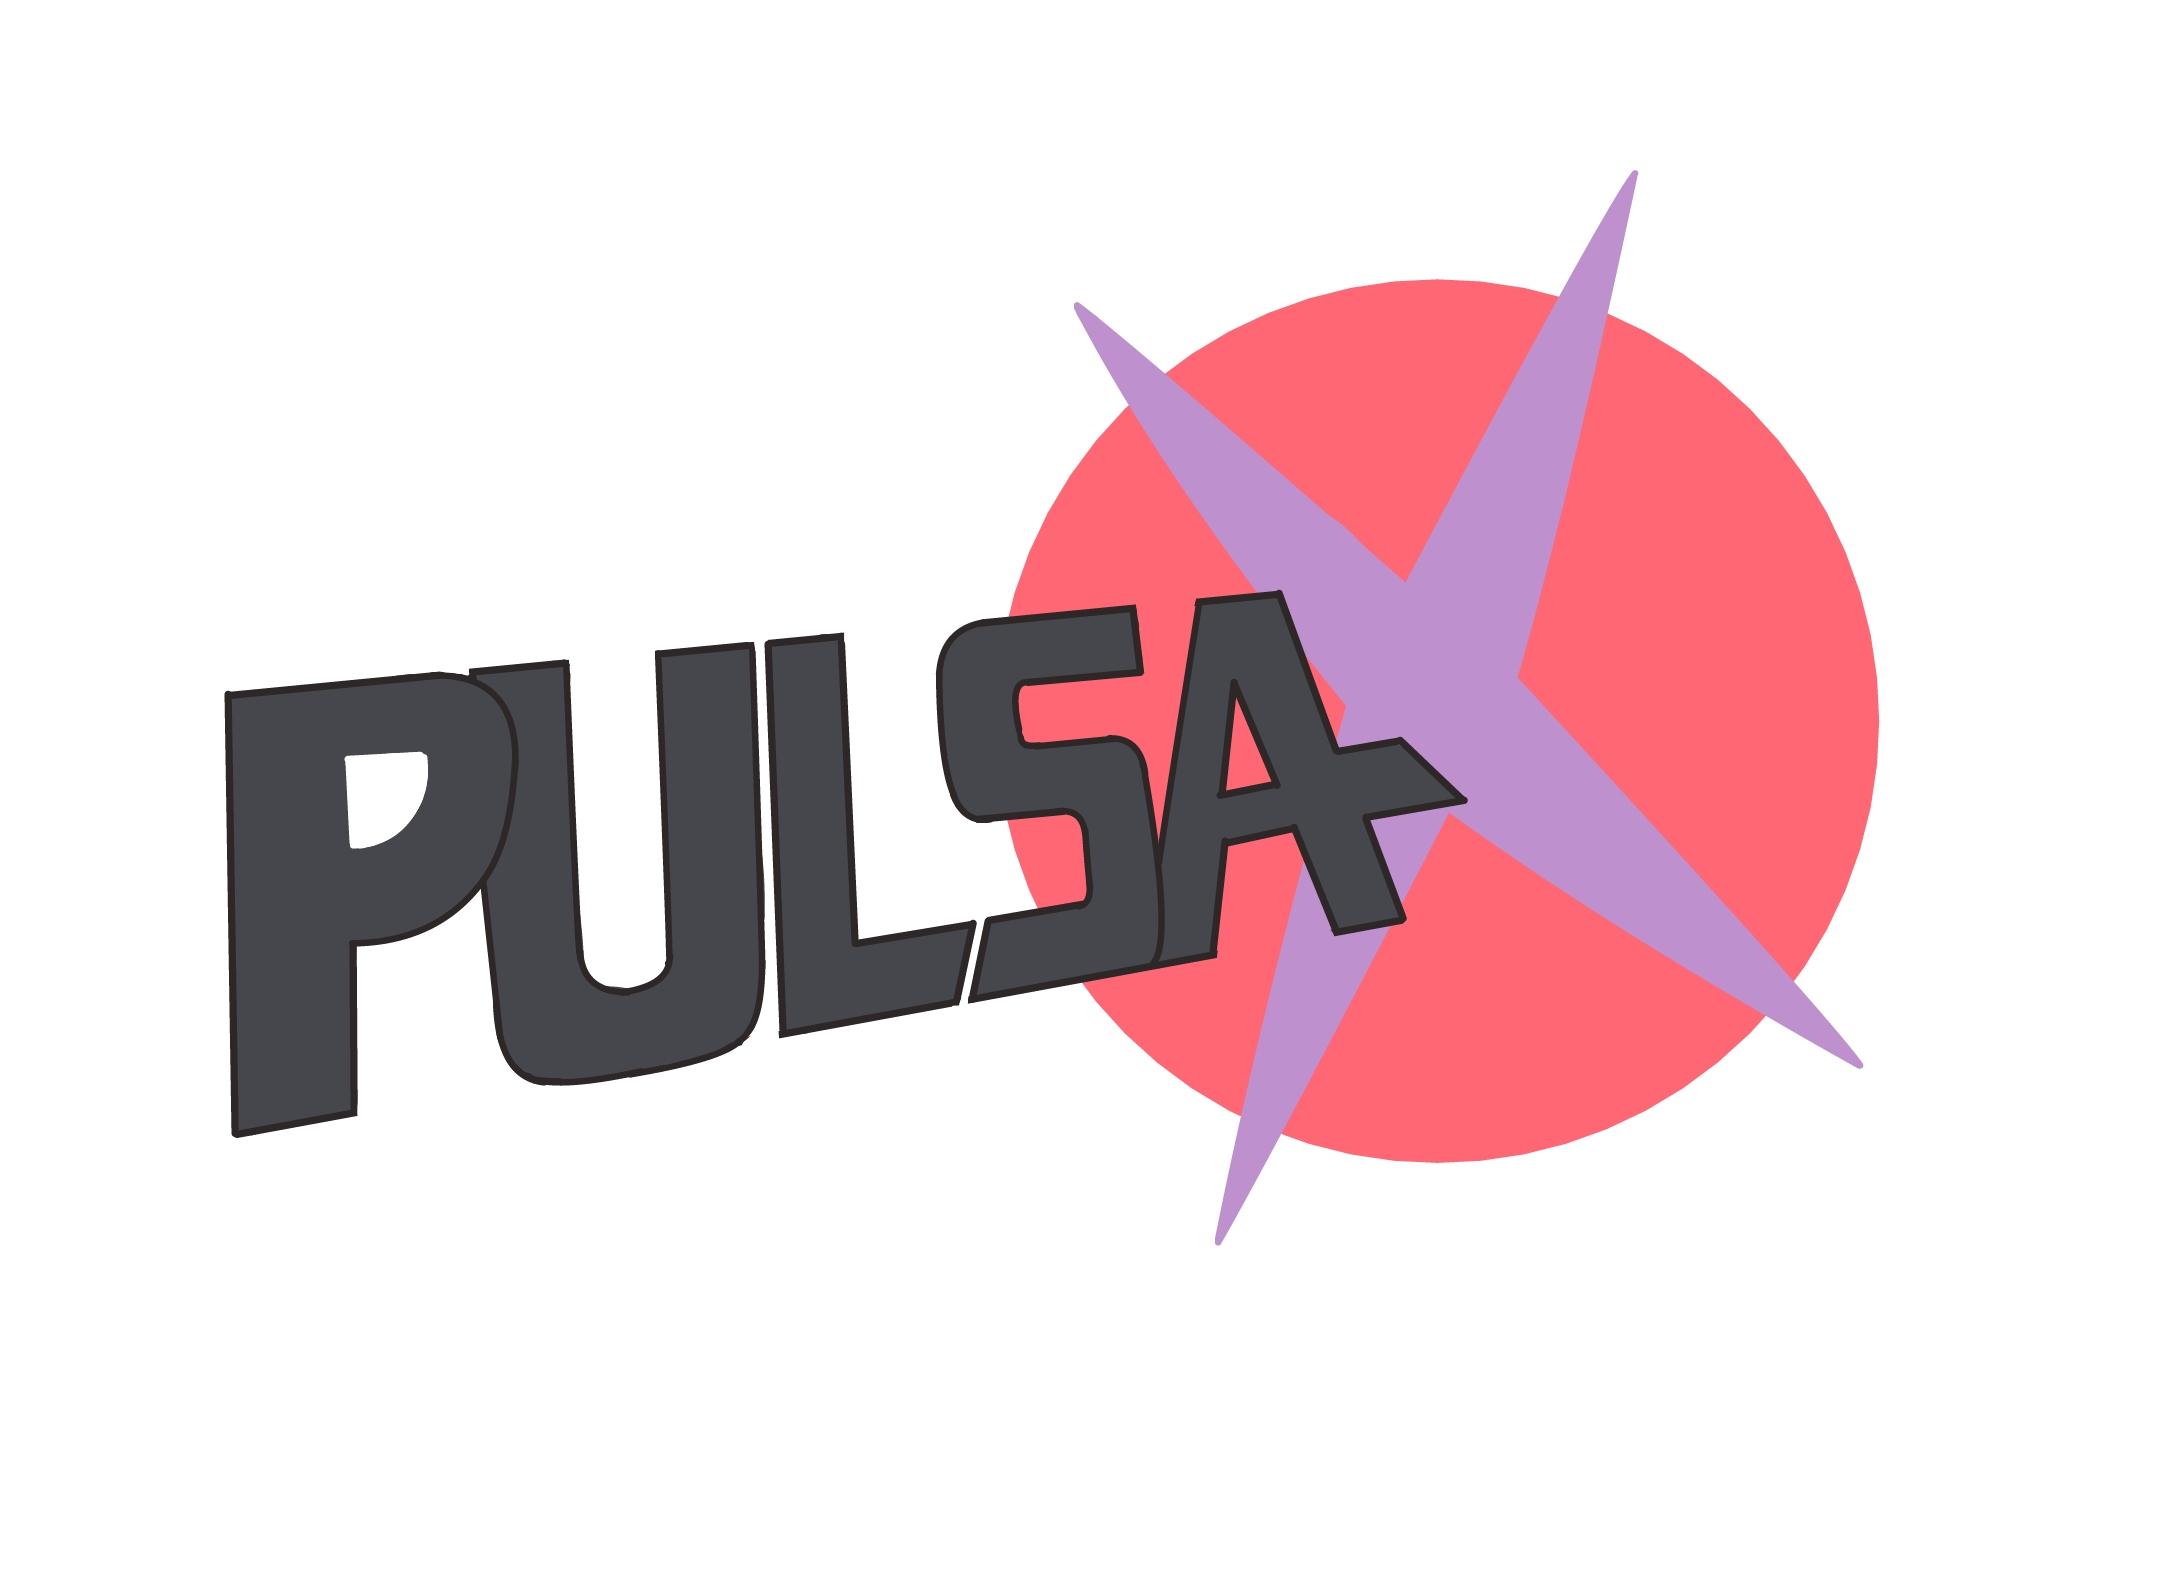 PULSAX-PROGRAMA5